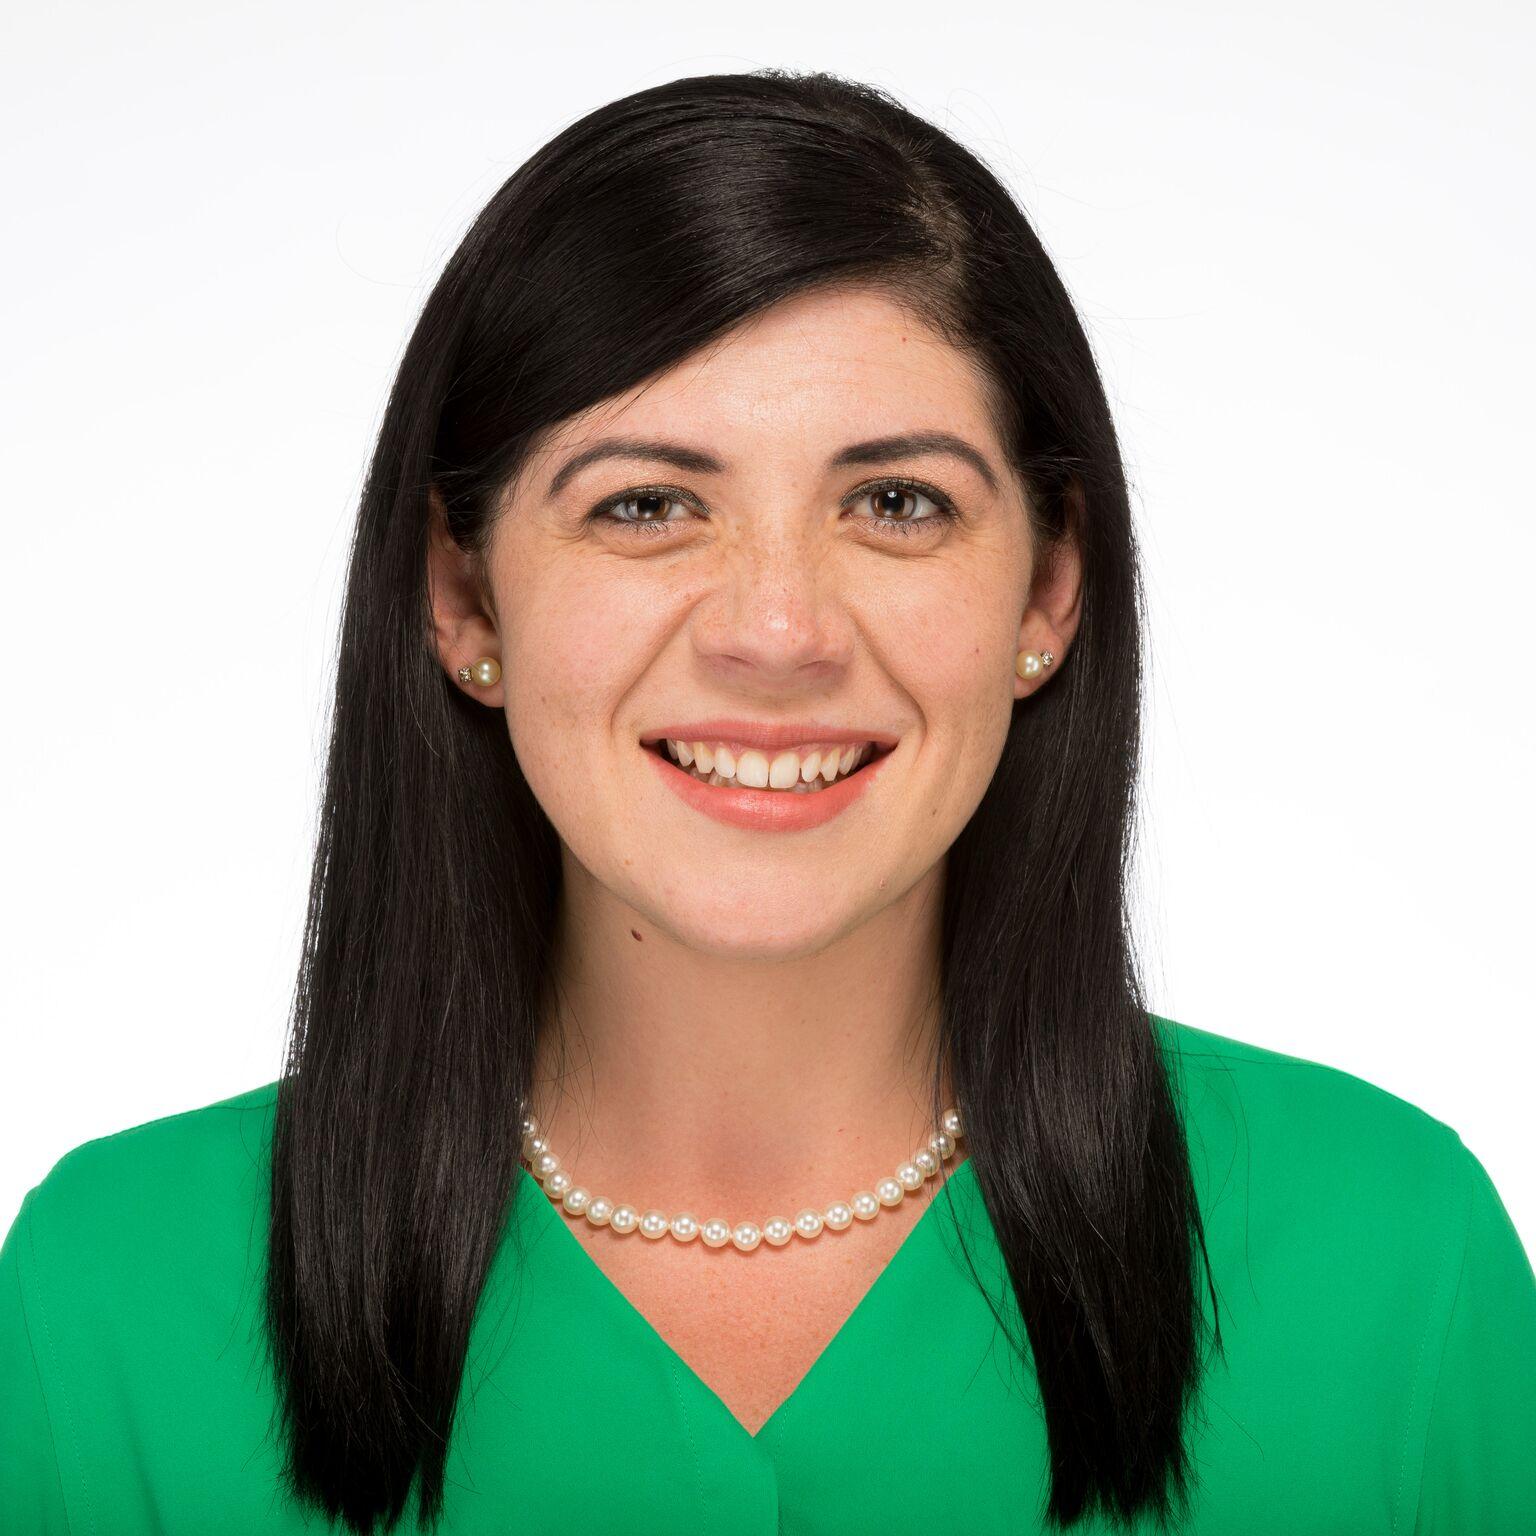 Jenna smiling and wearing a green shirt